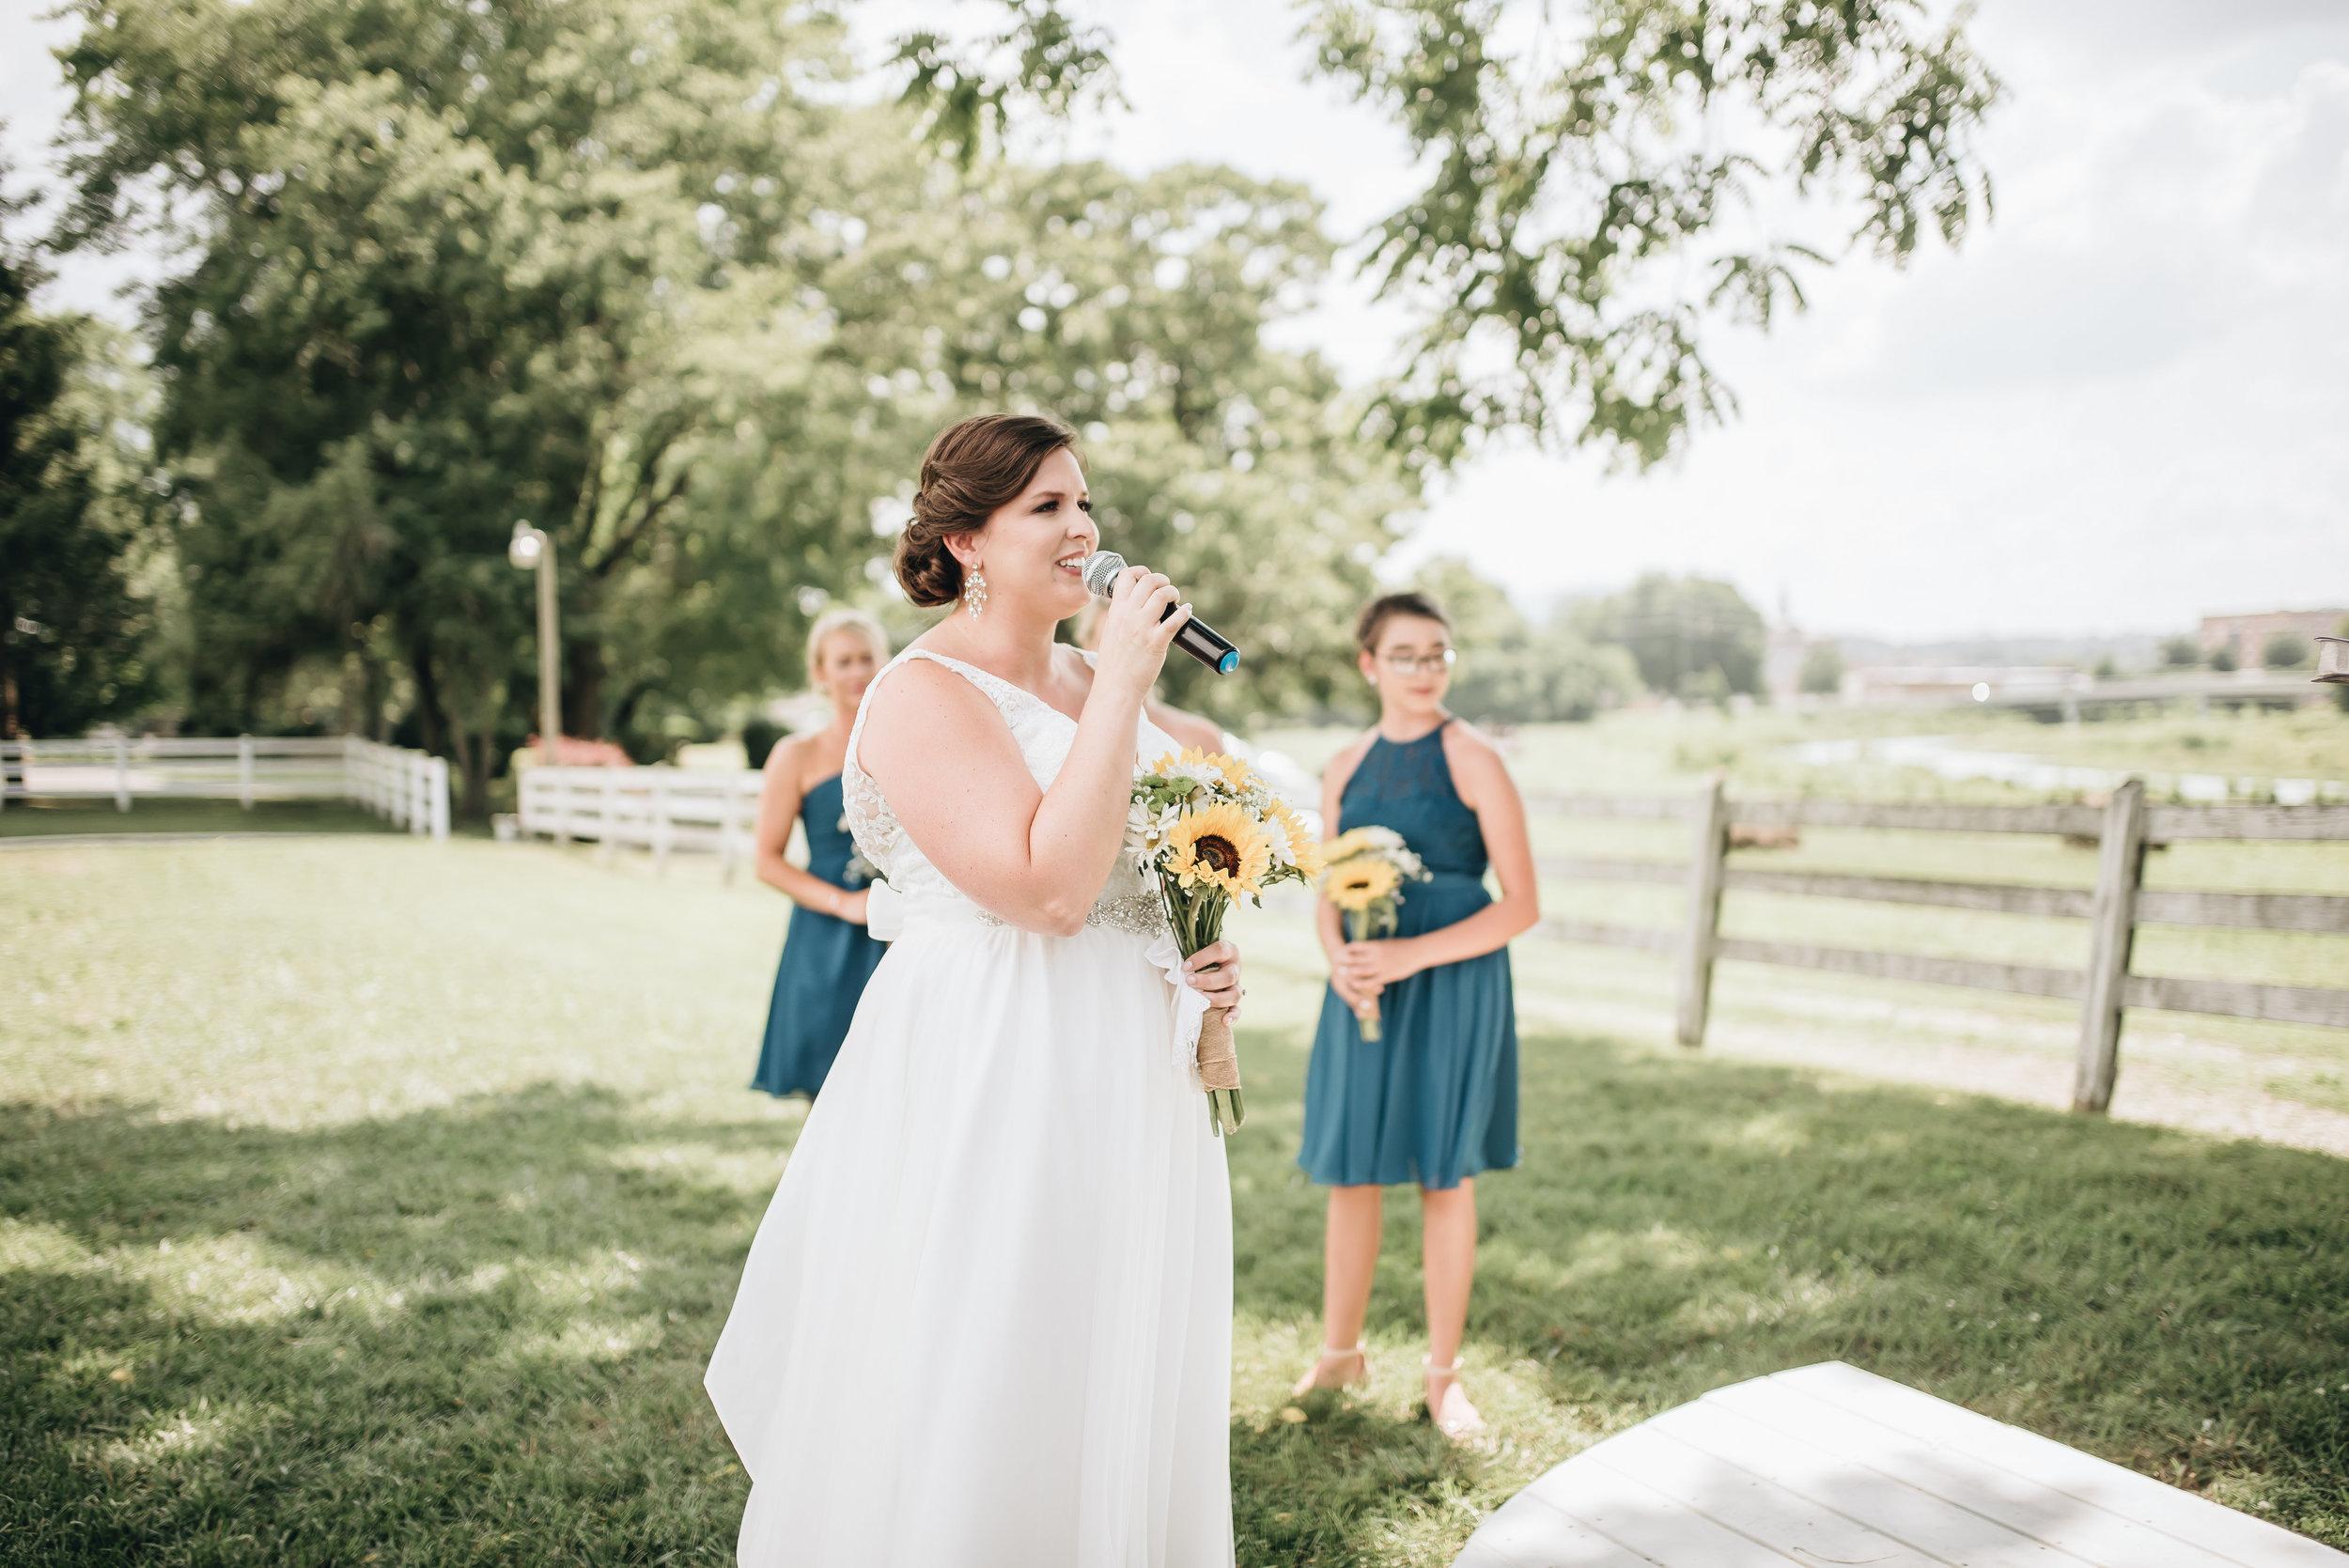 Cara and Shaun Wedding - EDITS-0194 - Copy.jpg